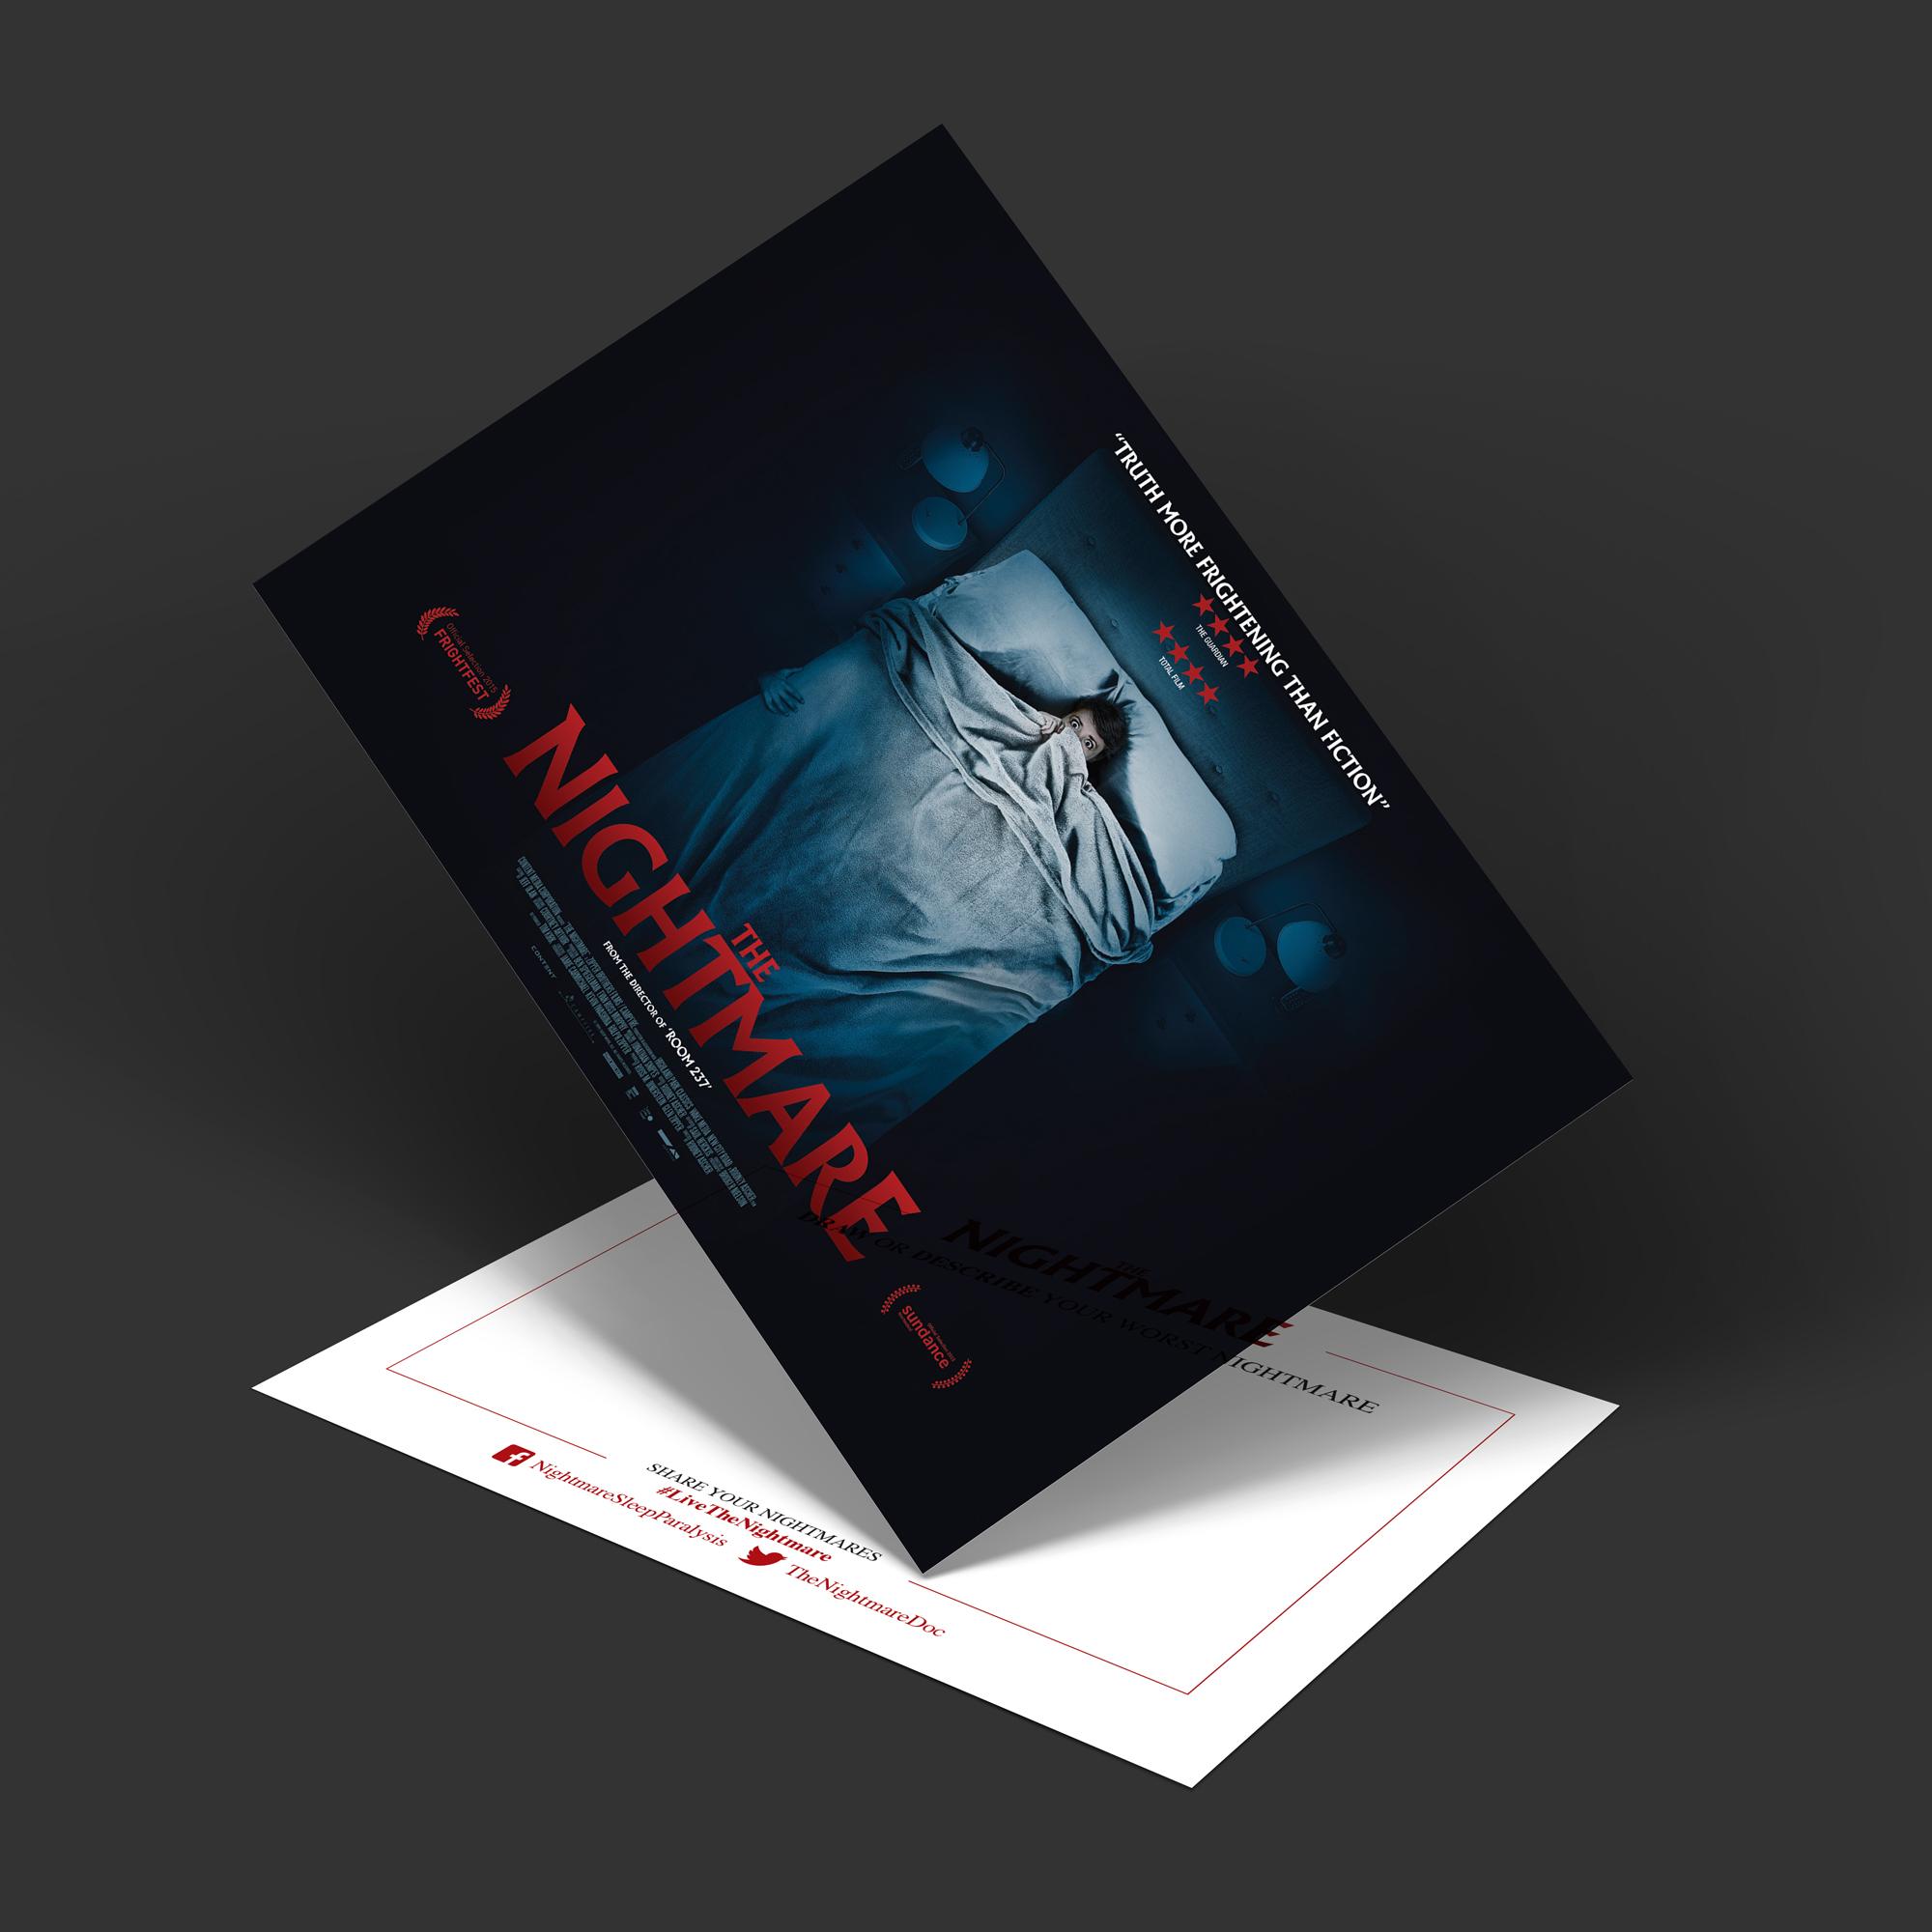 Nightmare-Postcard